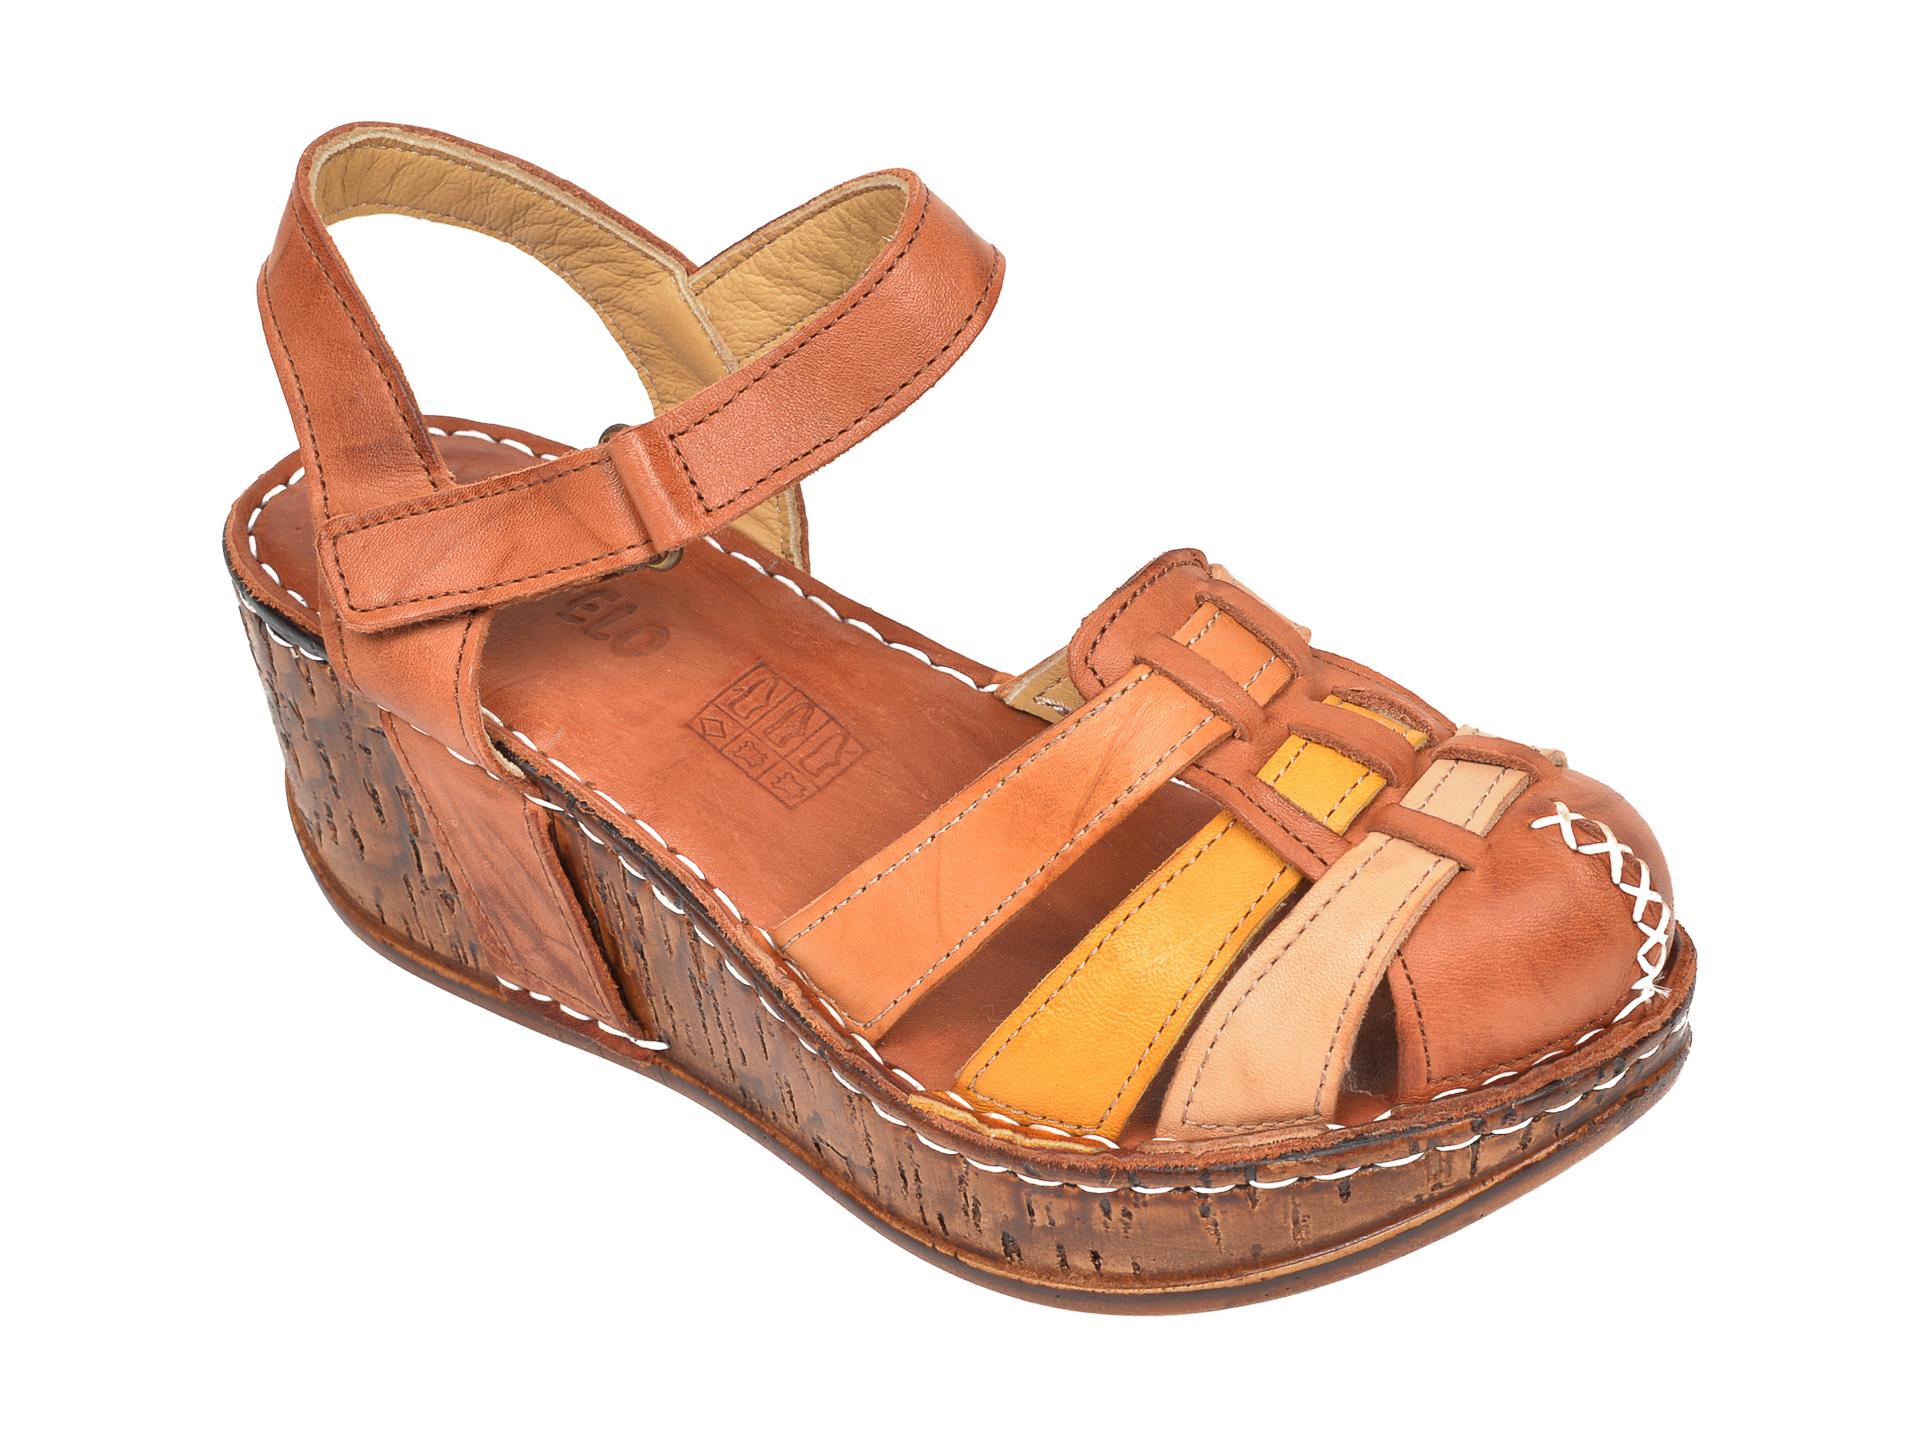 Sandale CONSUELO maro, 1430, din piele naturala